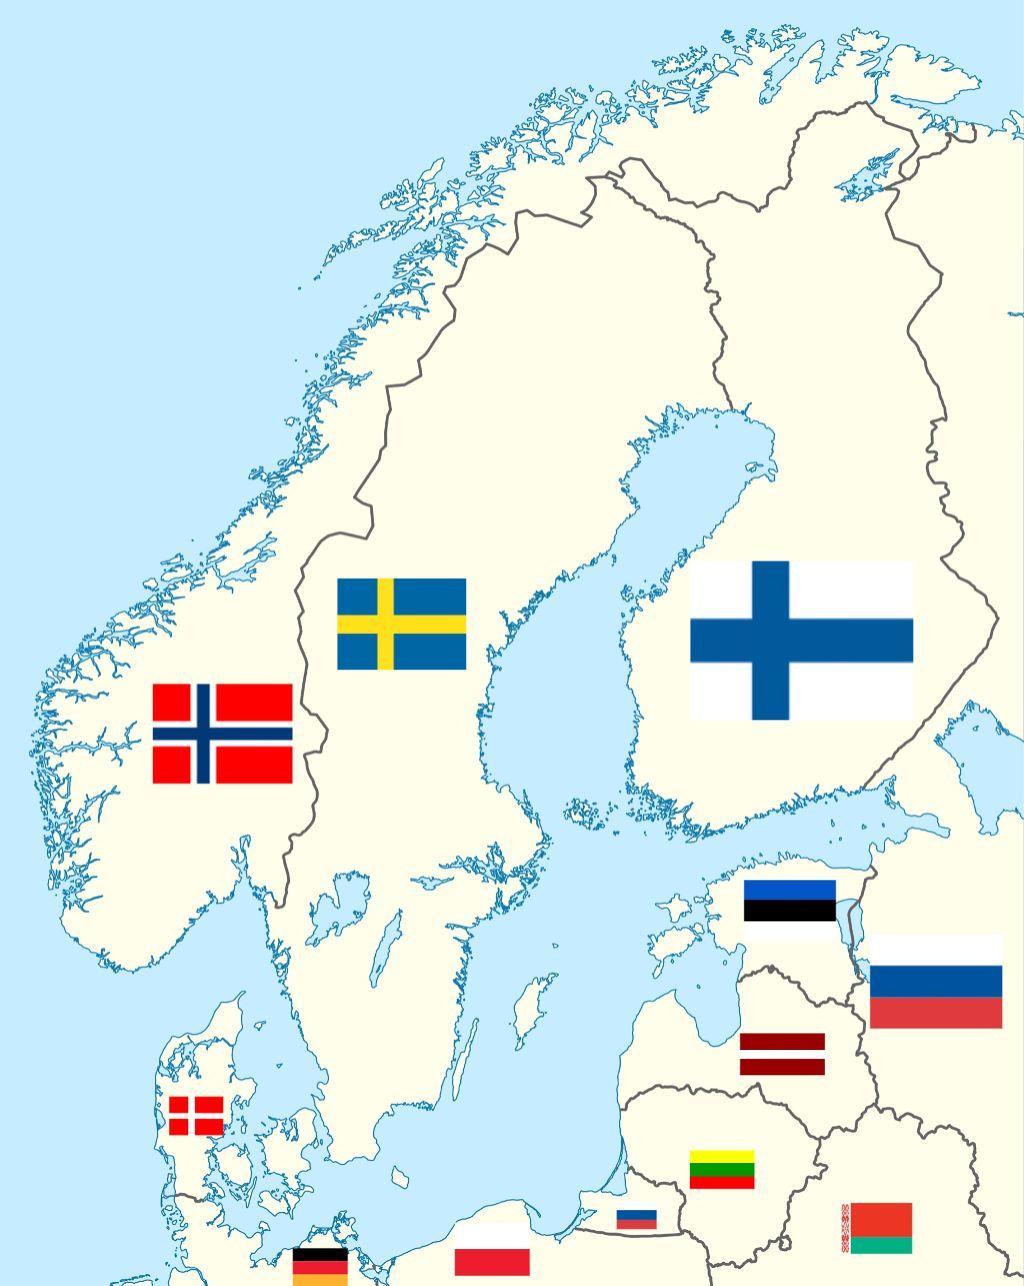 Scandinavia On Map on scandinavian peninsula map, scaninavia map, new zealand on map, swedish on map, norway map, bergen on map, sheboygan on map, baltic sea on map, british america on map, benelux on map, mountain states on map, scandinavian highlands on map, mongolia on map, preikestolen on map, alps on map, middle ages on map, iberian peninsula on map, british empire on map, the tropics on map, danube river on map,